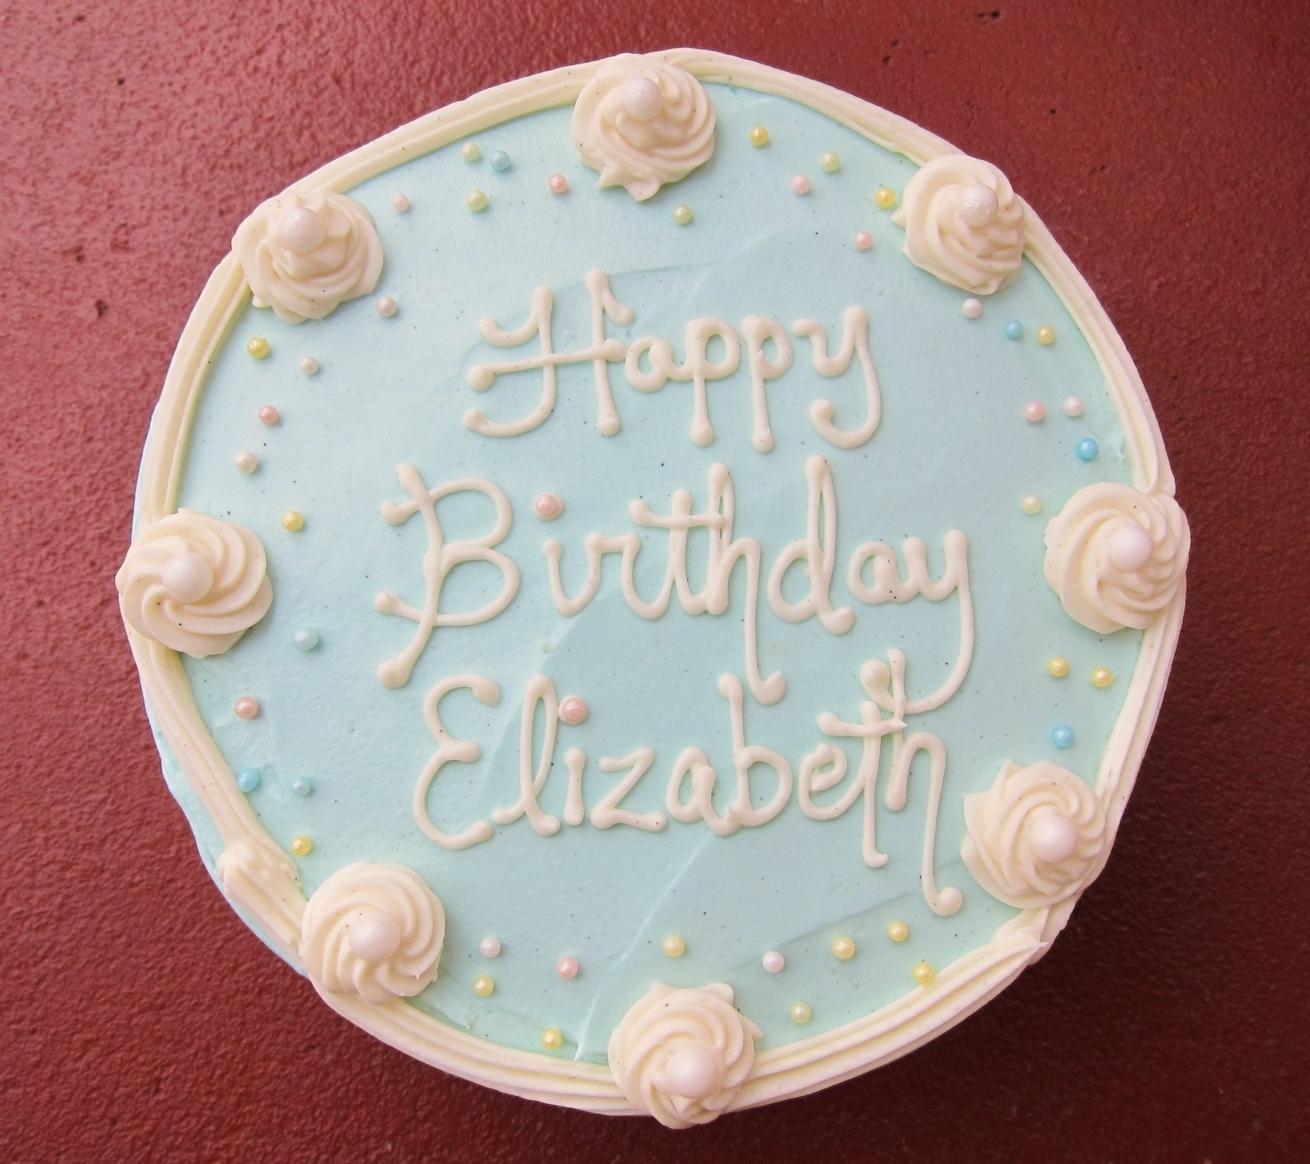 Elizabeth S Birthday Cake 2012 1 Butter Sugar Flowers